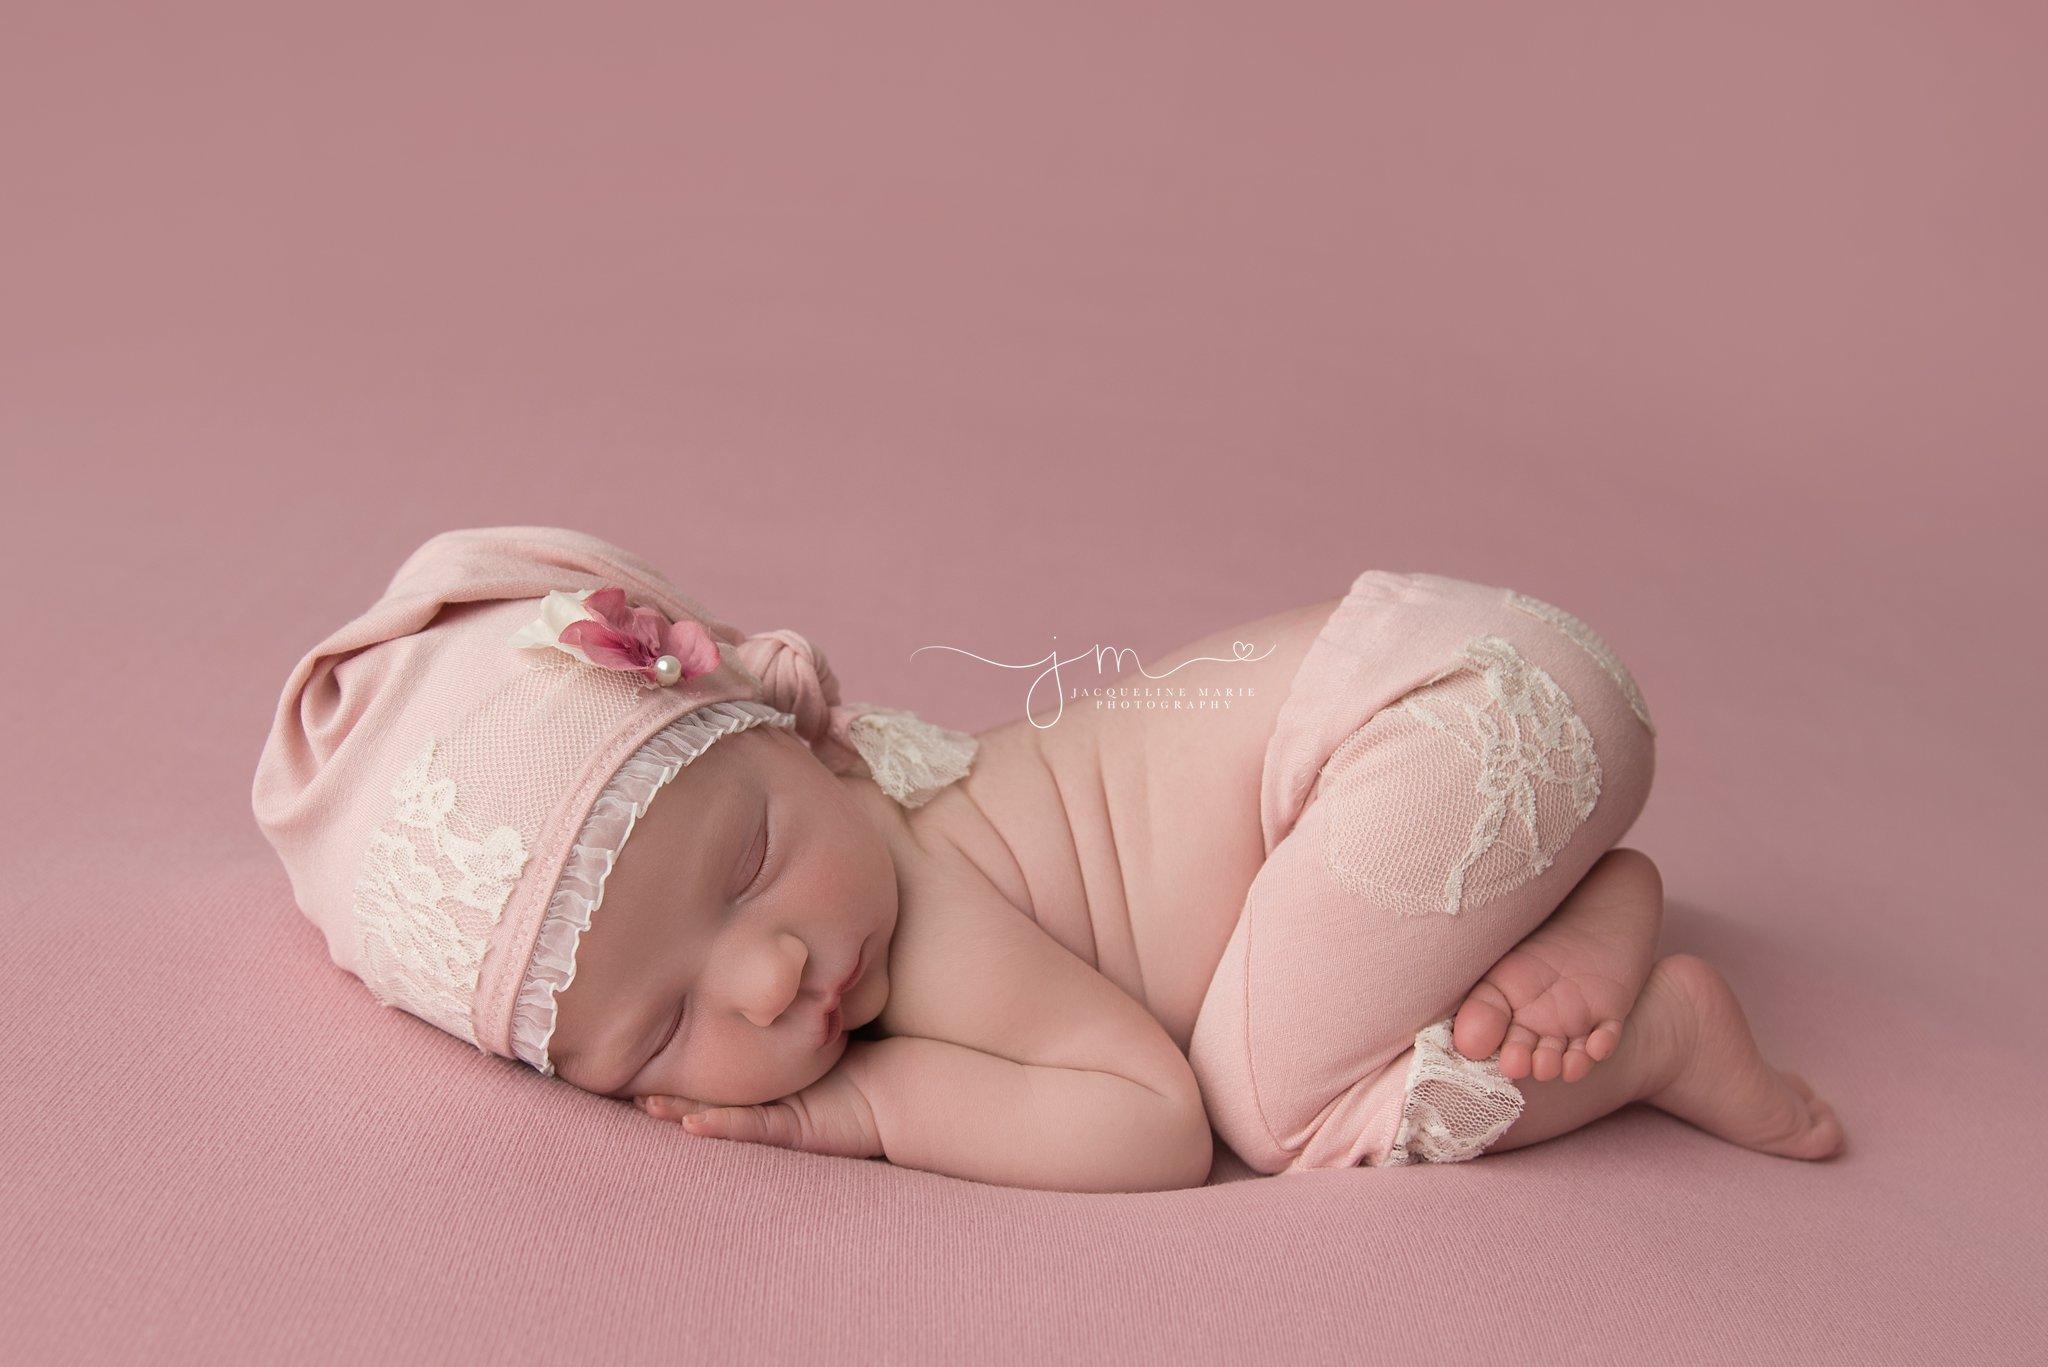 newborn baby girl wears pink sleepy hat and pants for newborn pictures in columbus ohio newborn studio